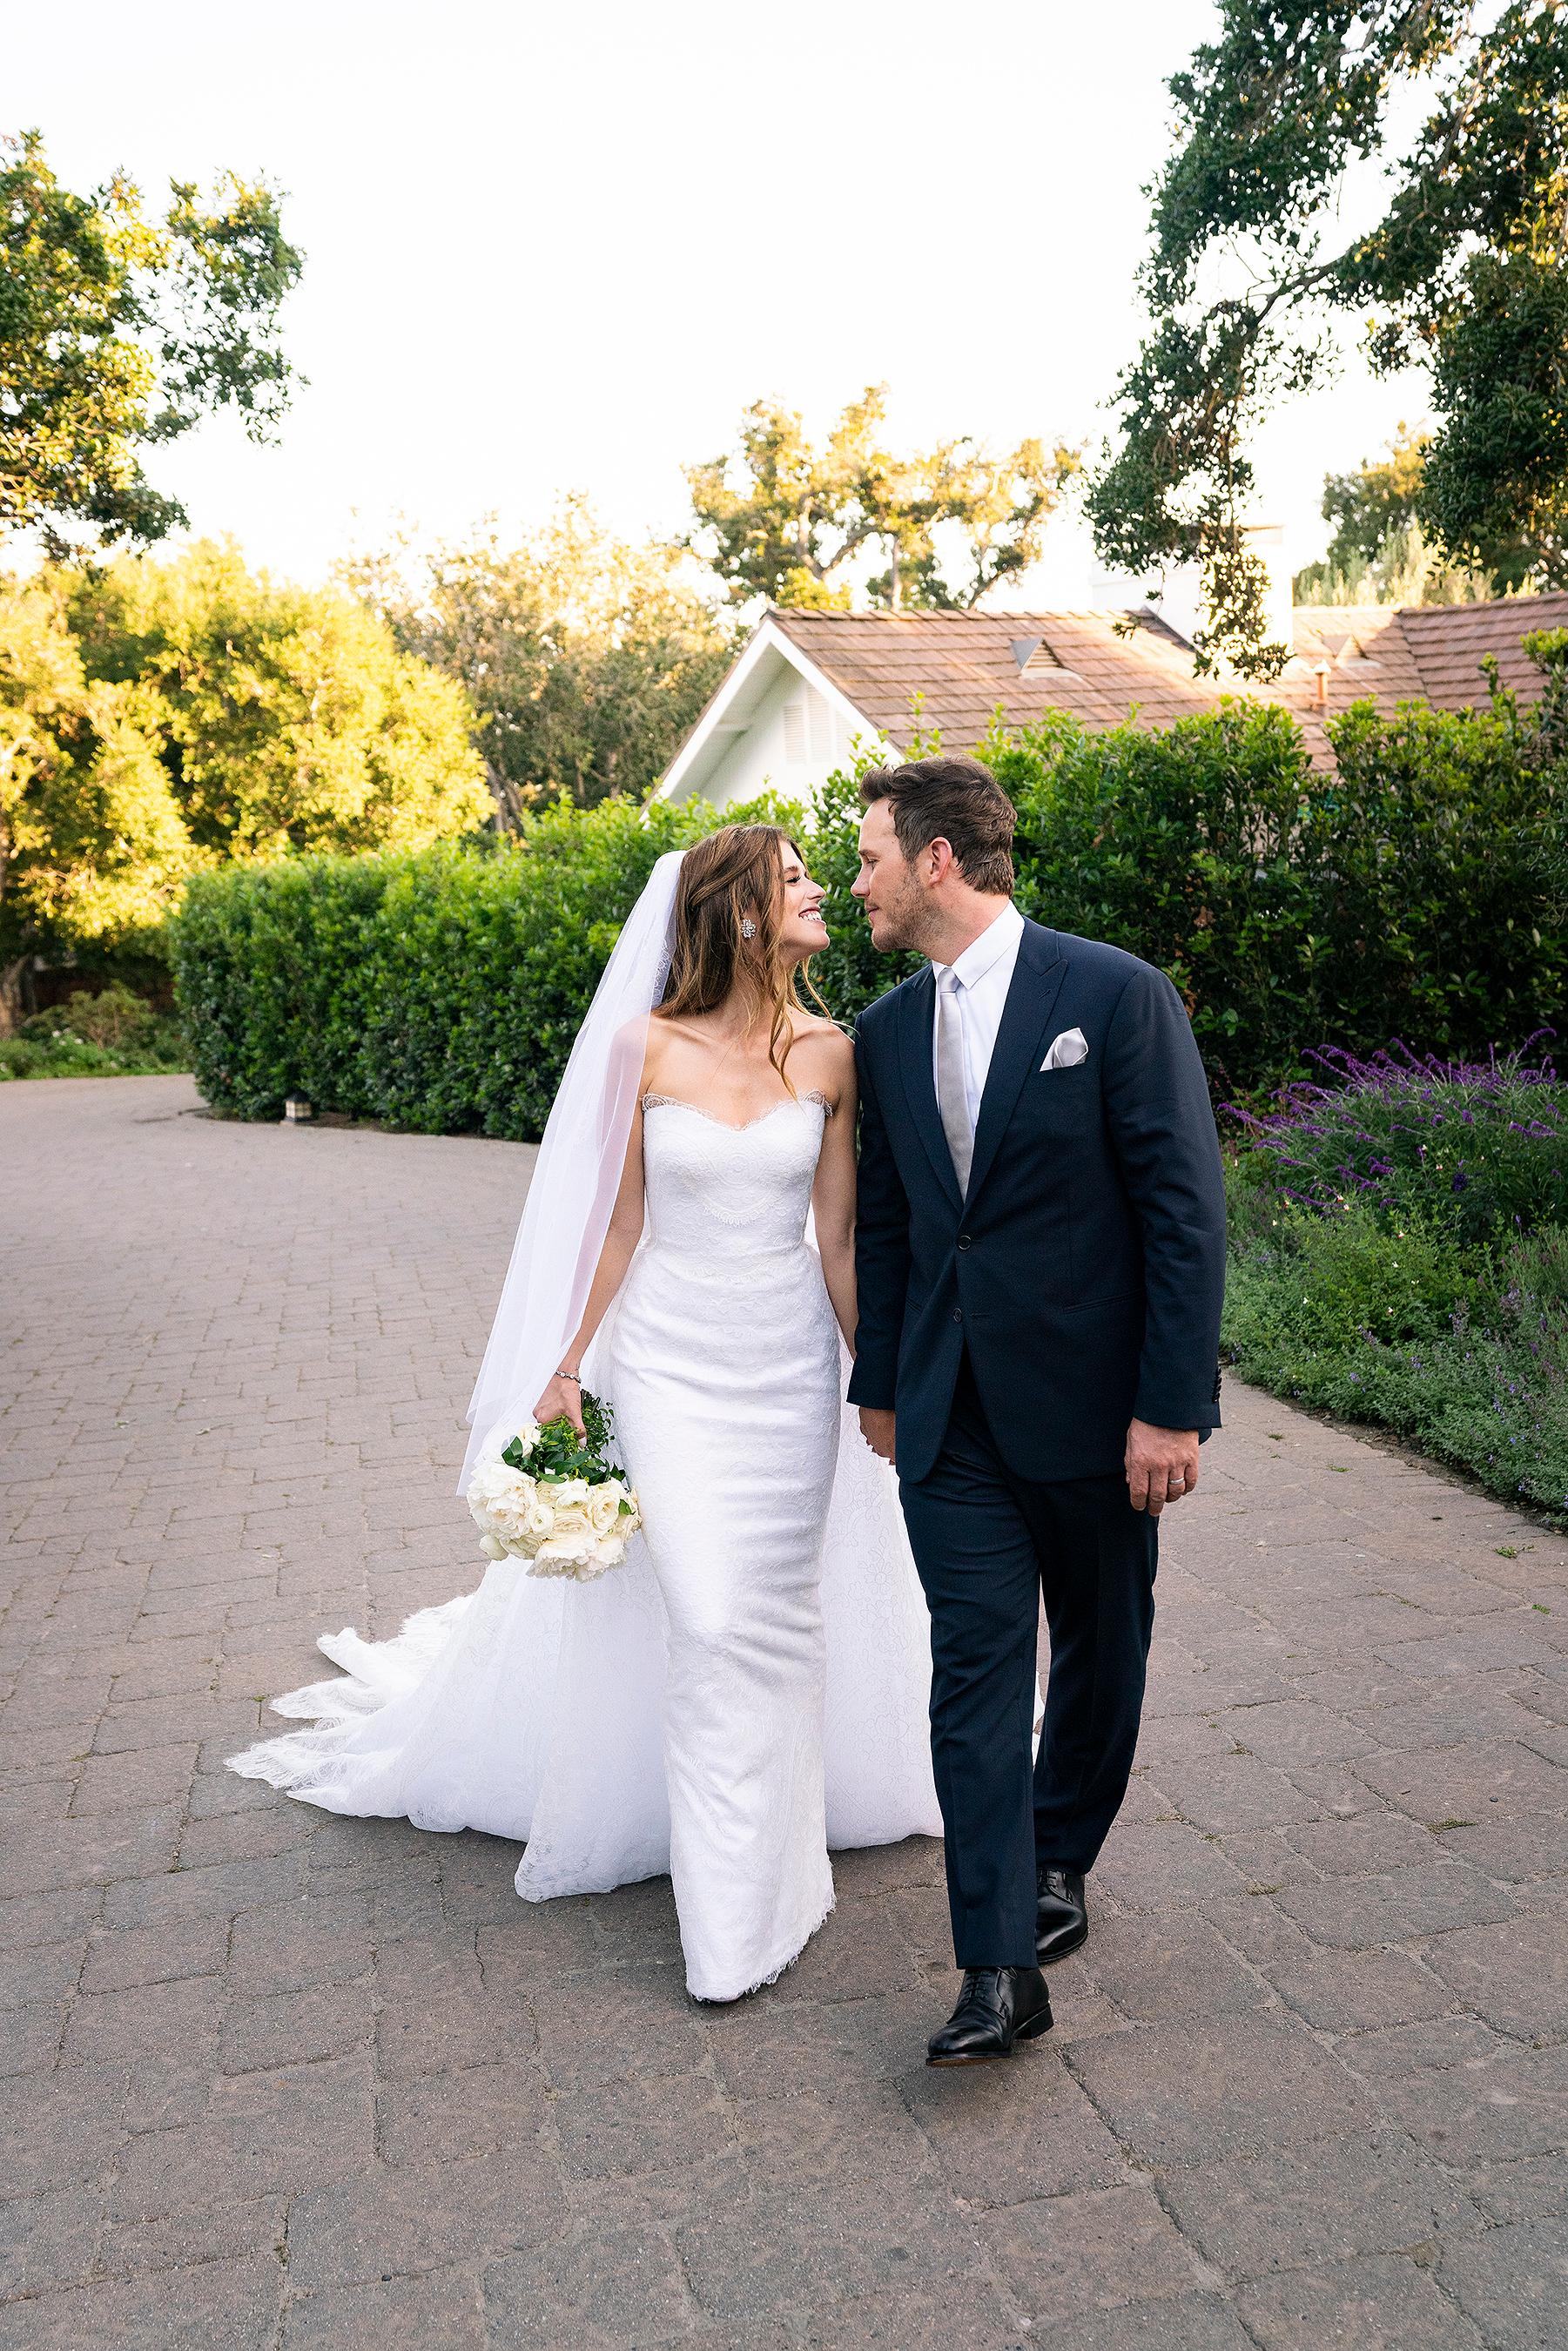 katherine schwarzenegger vestido de casamento